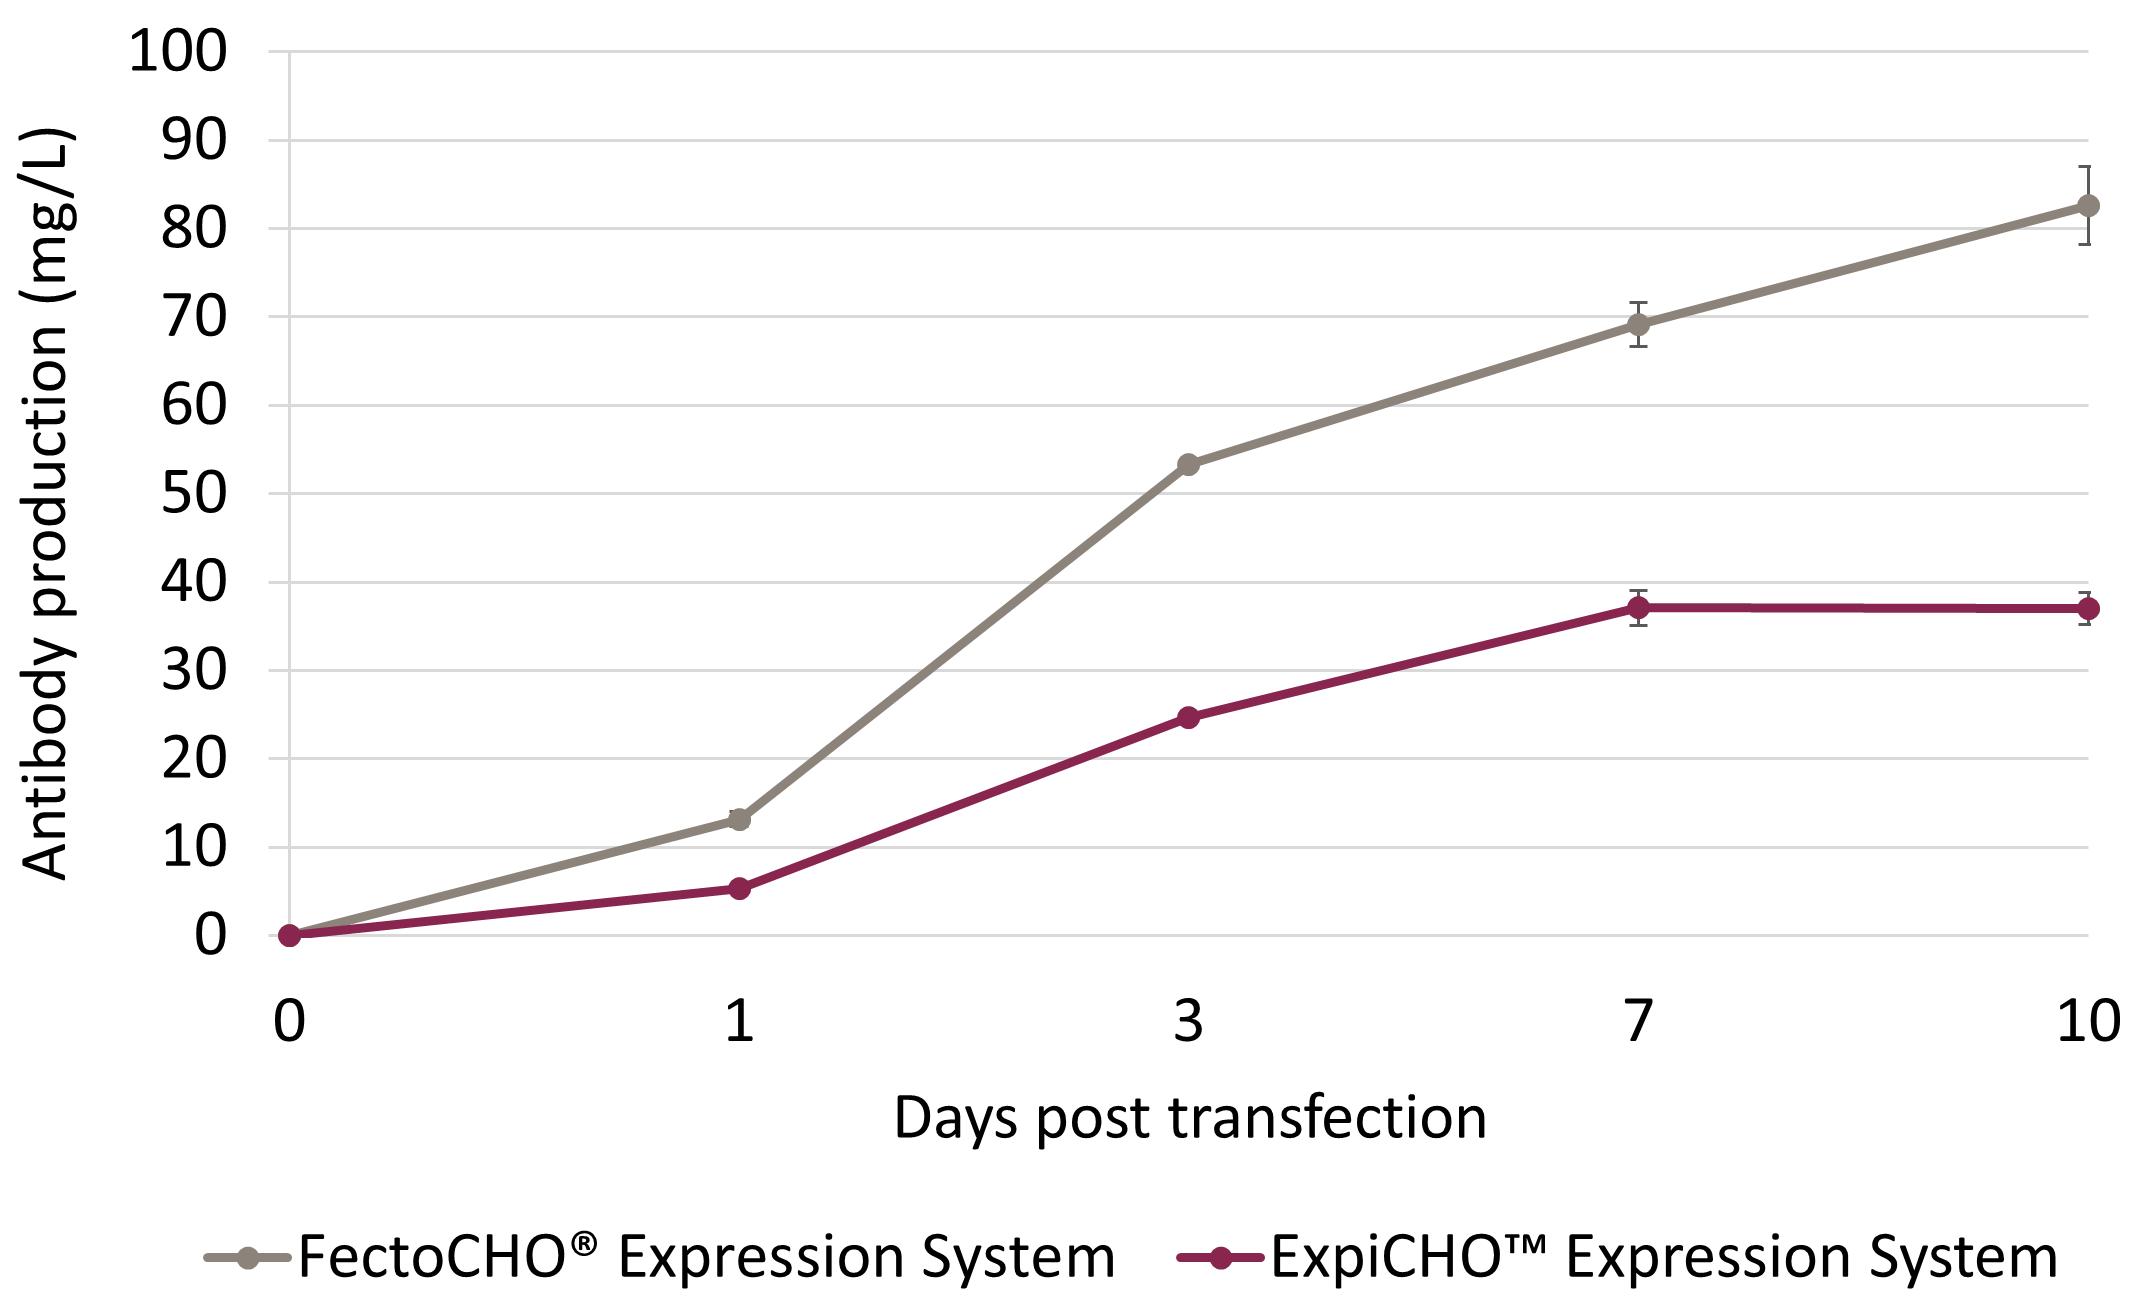 FectoCHO Expression System vs ExpiCHO system